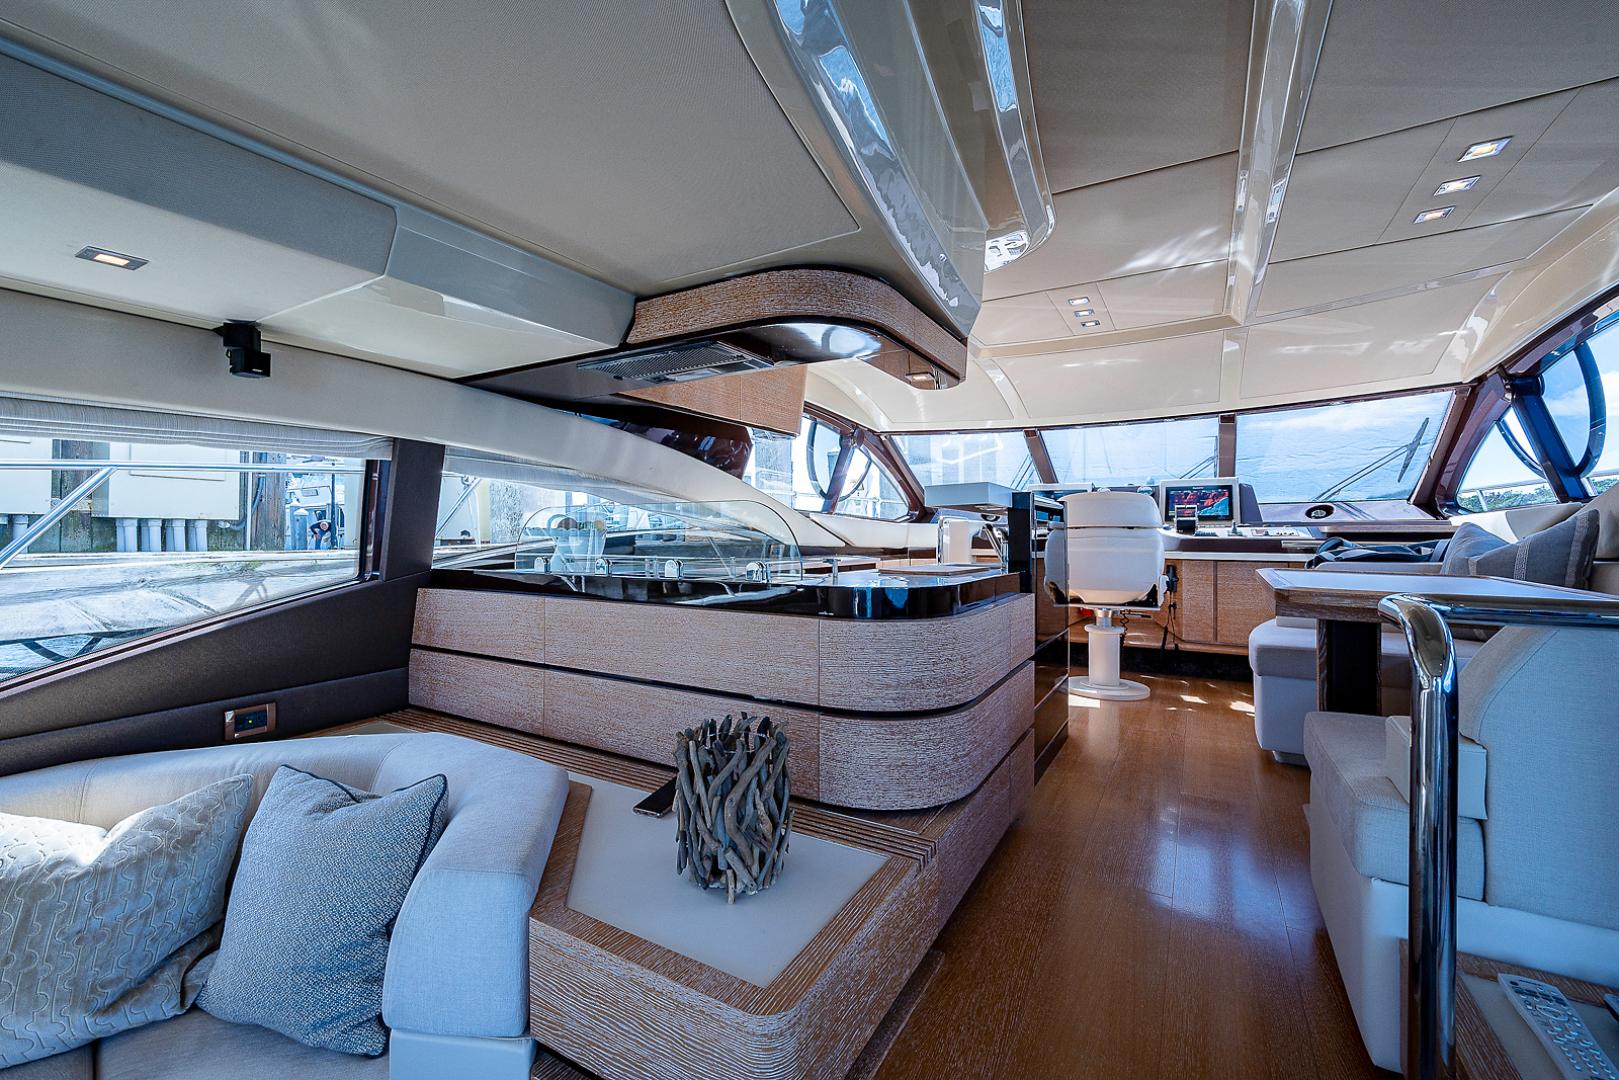 Azimut-58 Fly Motor Yacht 2011-Nova Fort Lauderdale-Florida-United States-58_azimut_nova__galley10-1490528 | Thumbnail